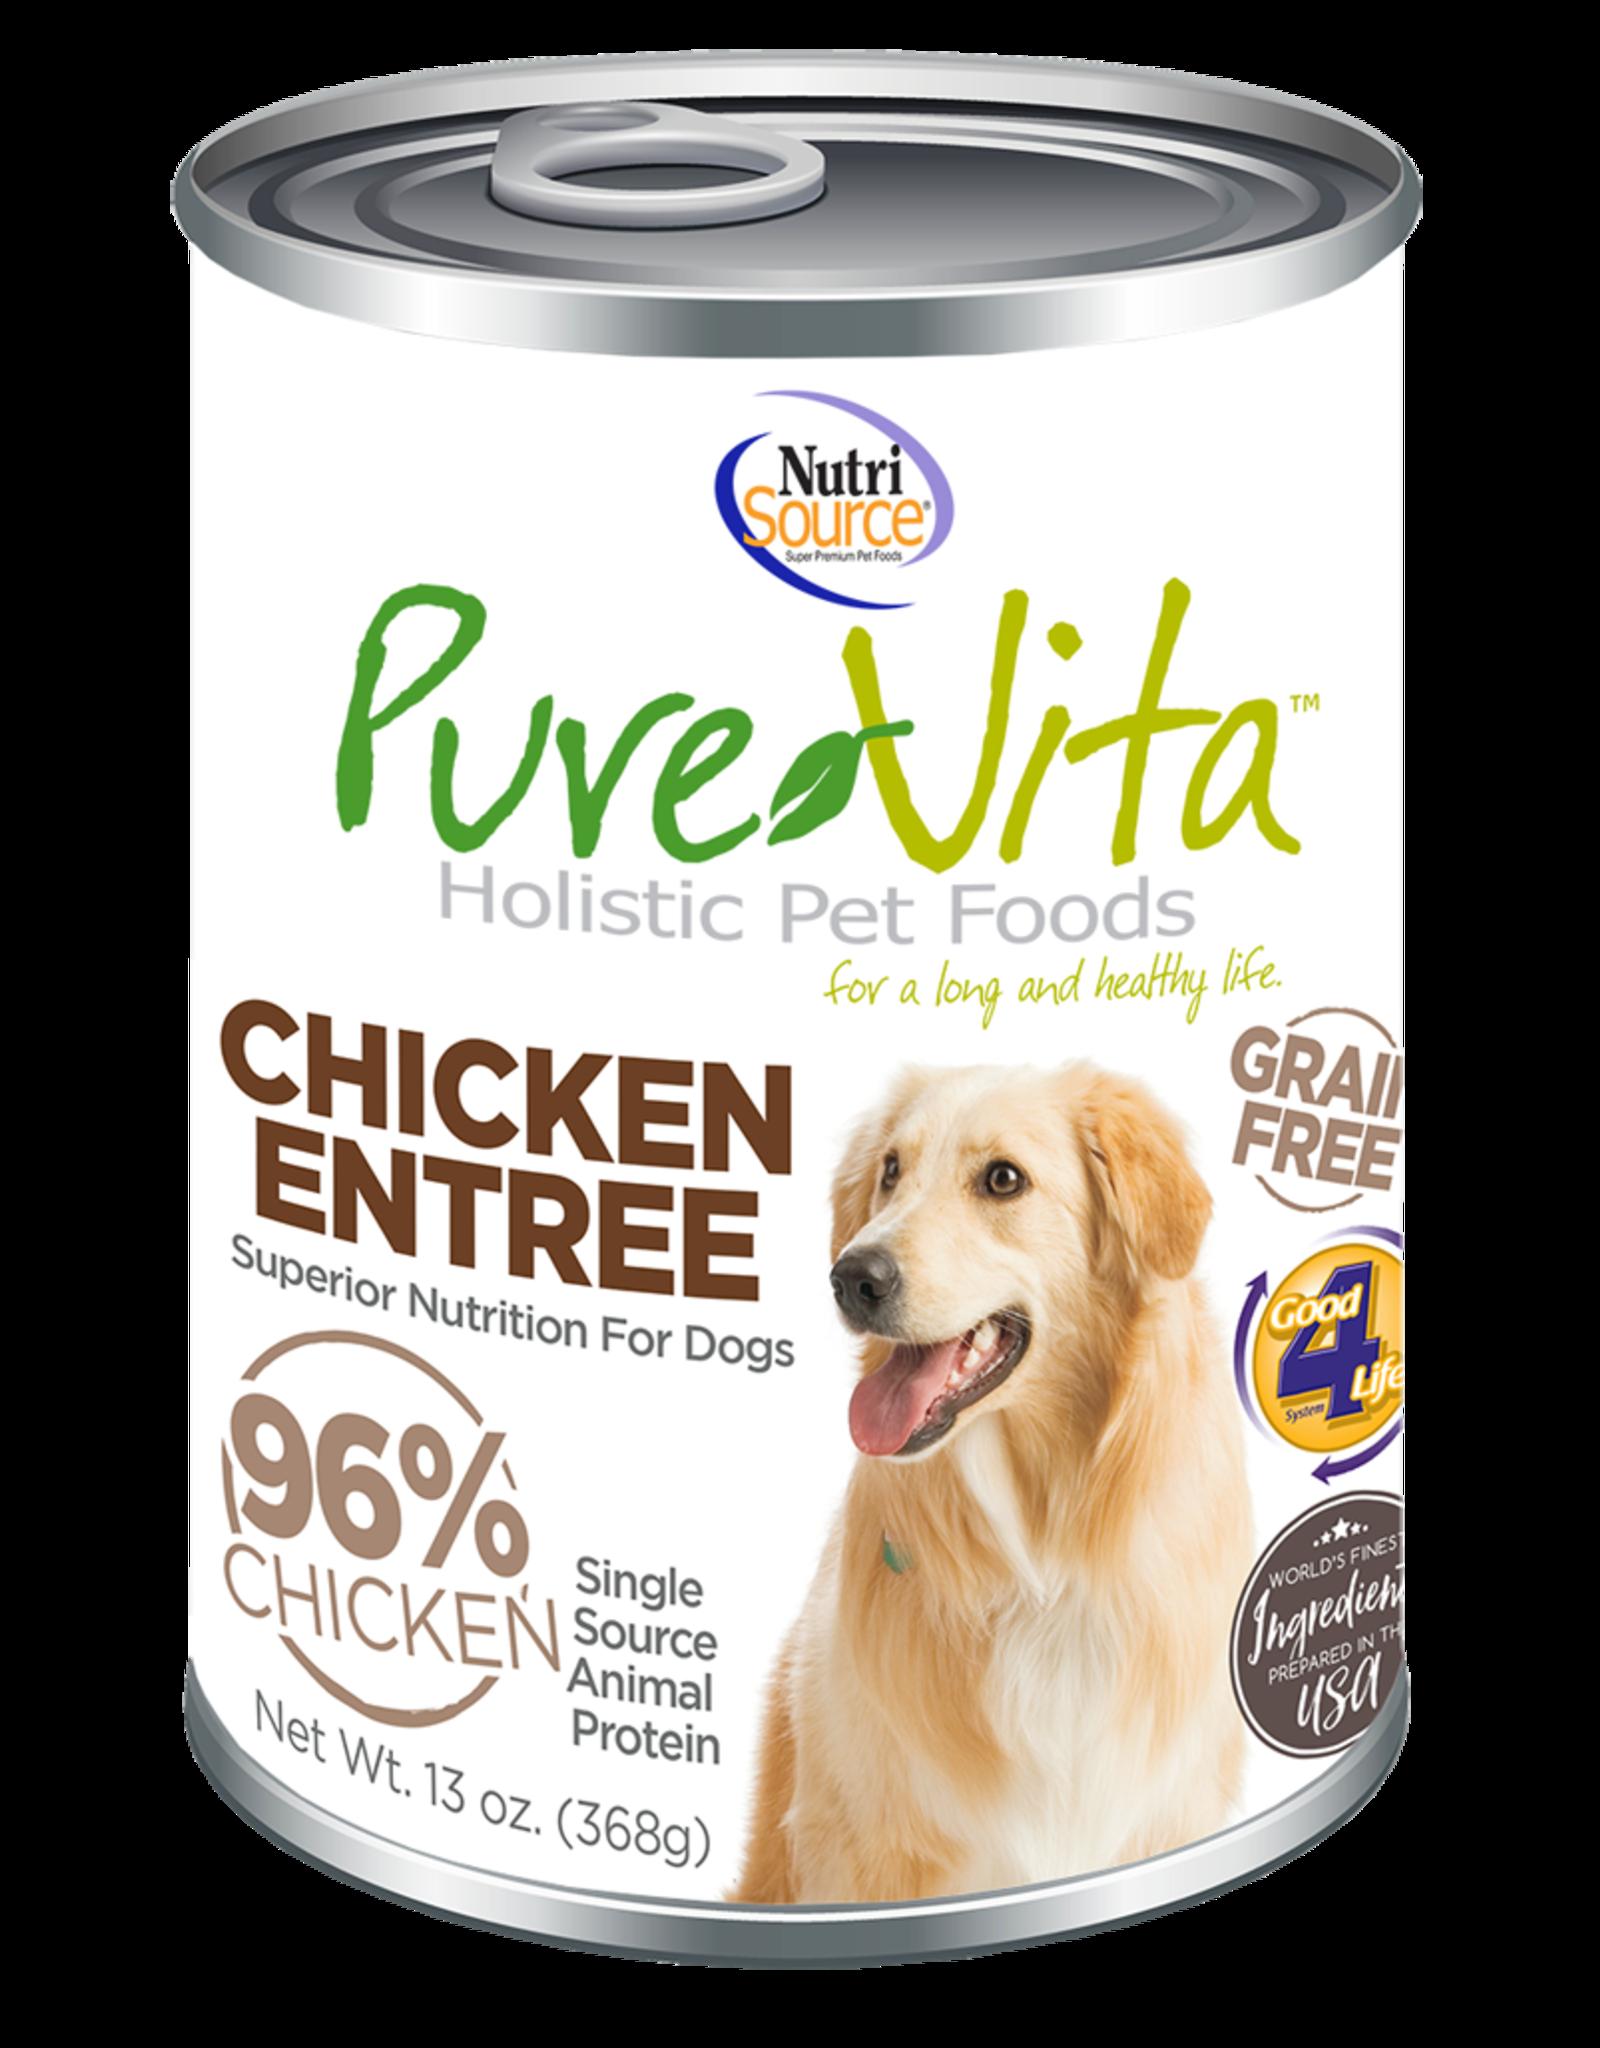 NutriSource Pet Foods PUREVITA DOG CHICKEN ENTRÉE 13OZ